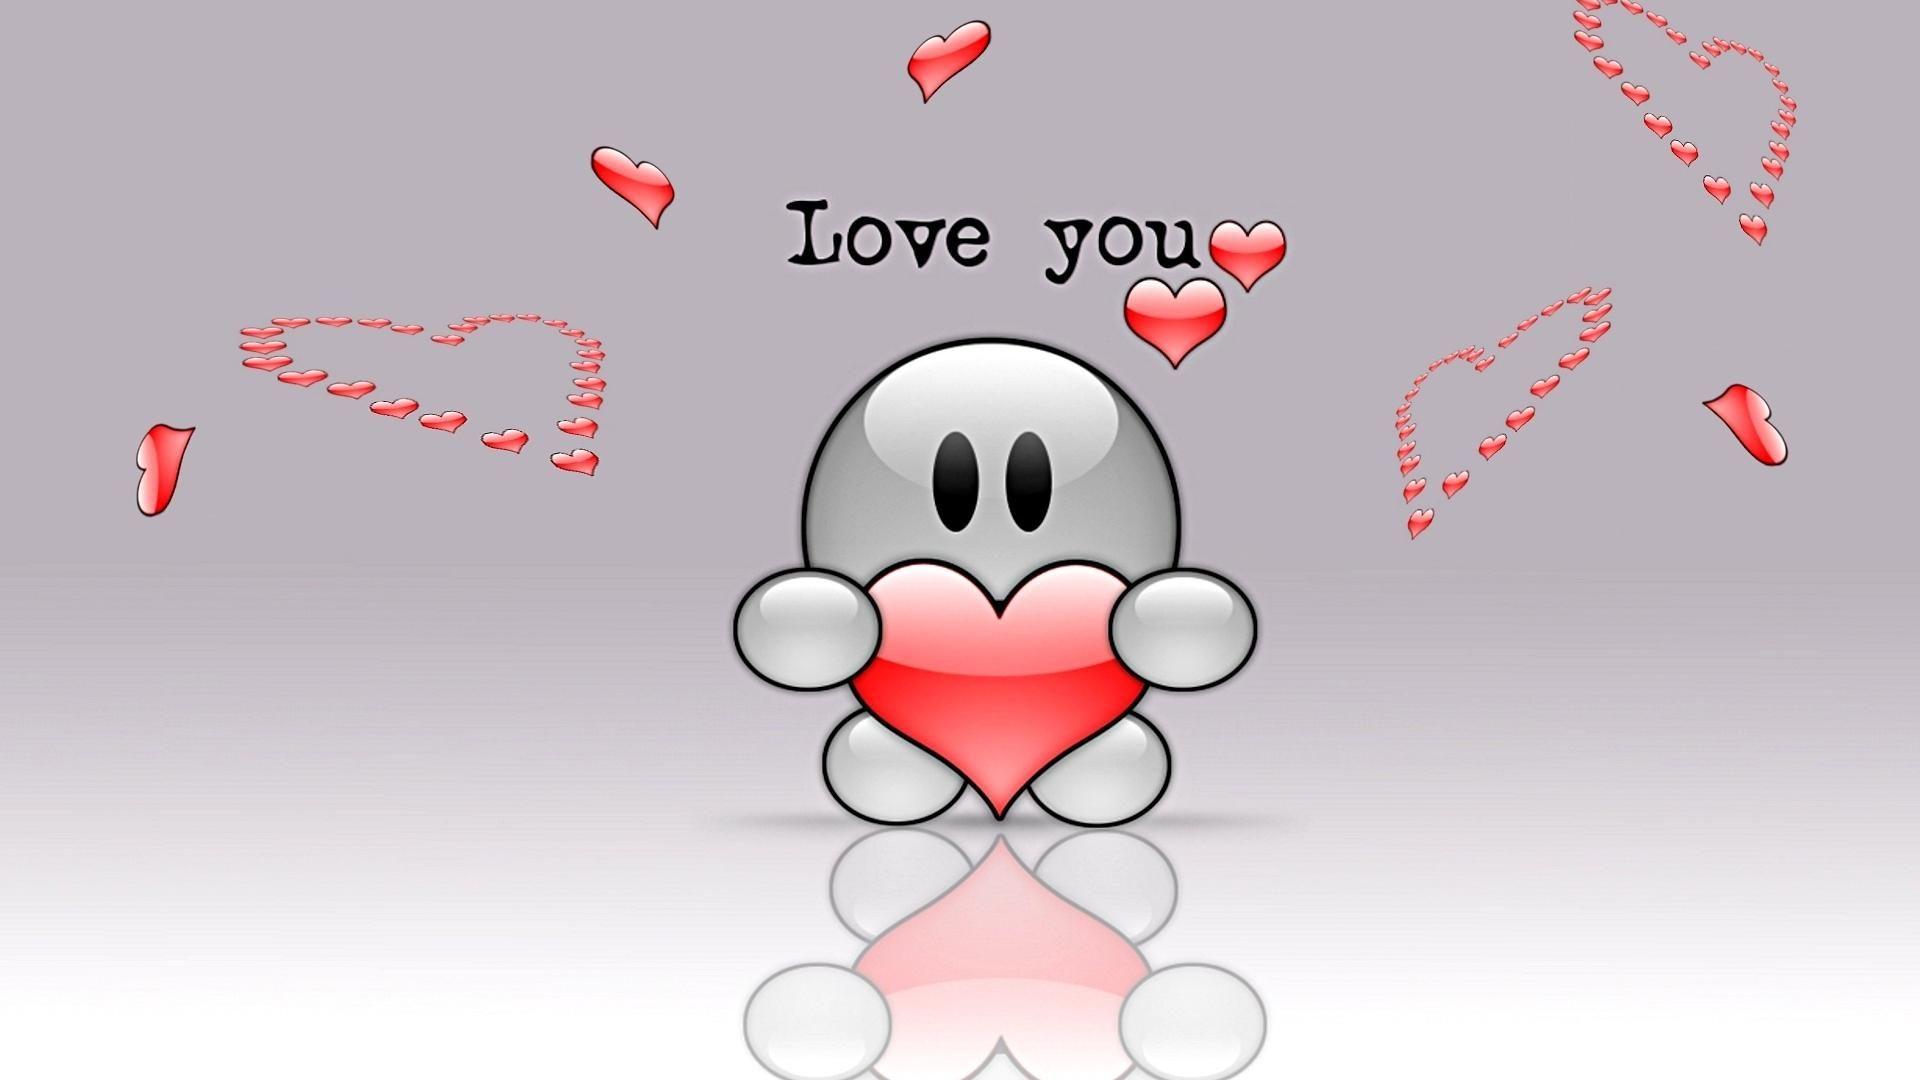 Love Cute Wallpaper Hd For Desktop 1920x1080 Cute Love Wallpapers Love You Cute I Love You Pictures